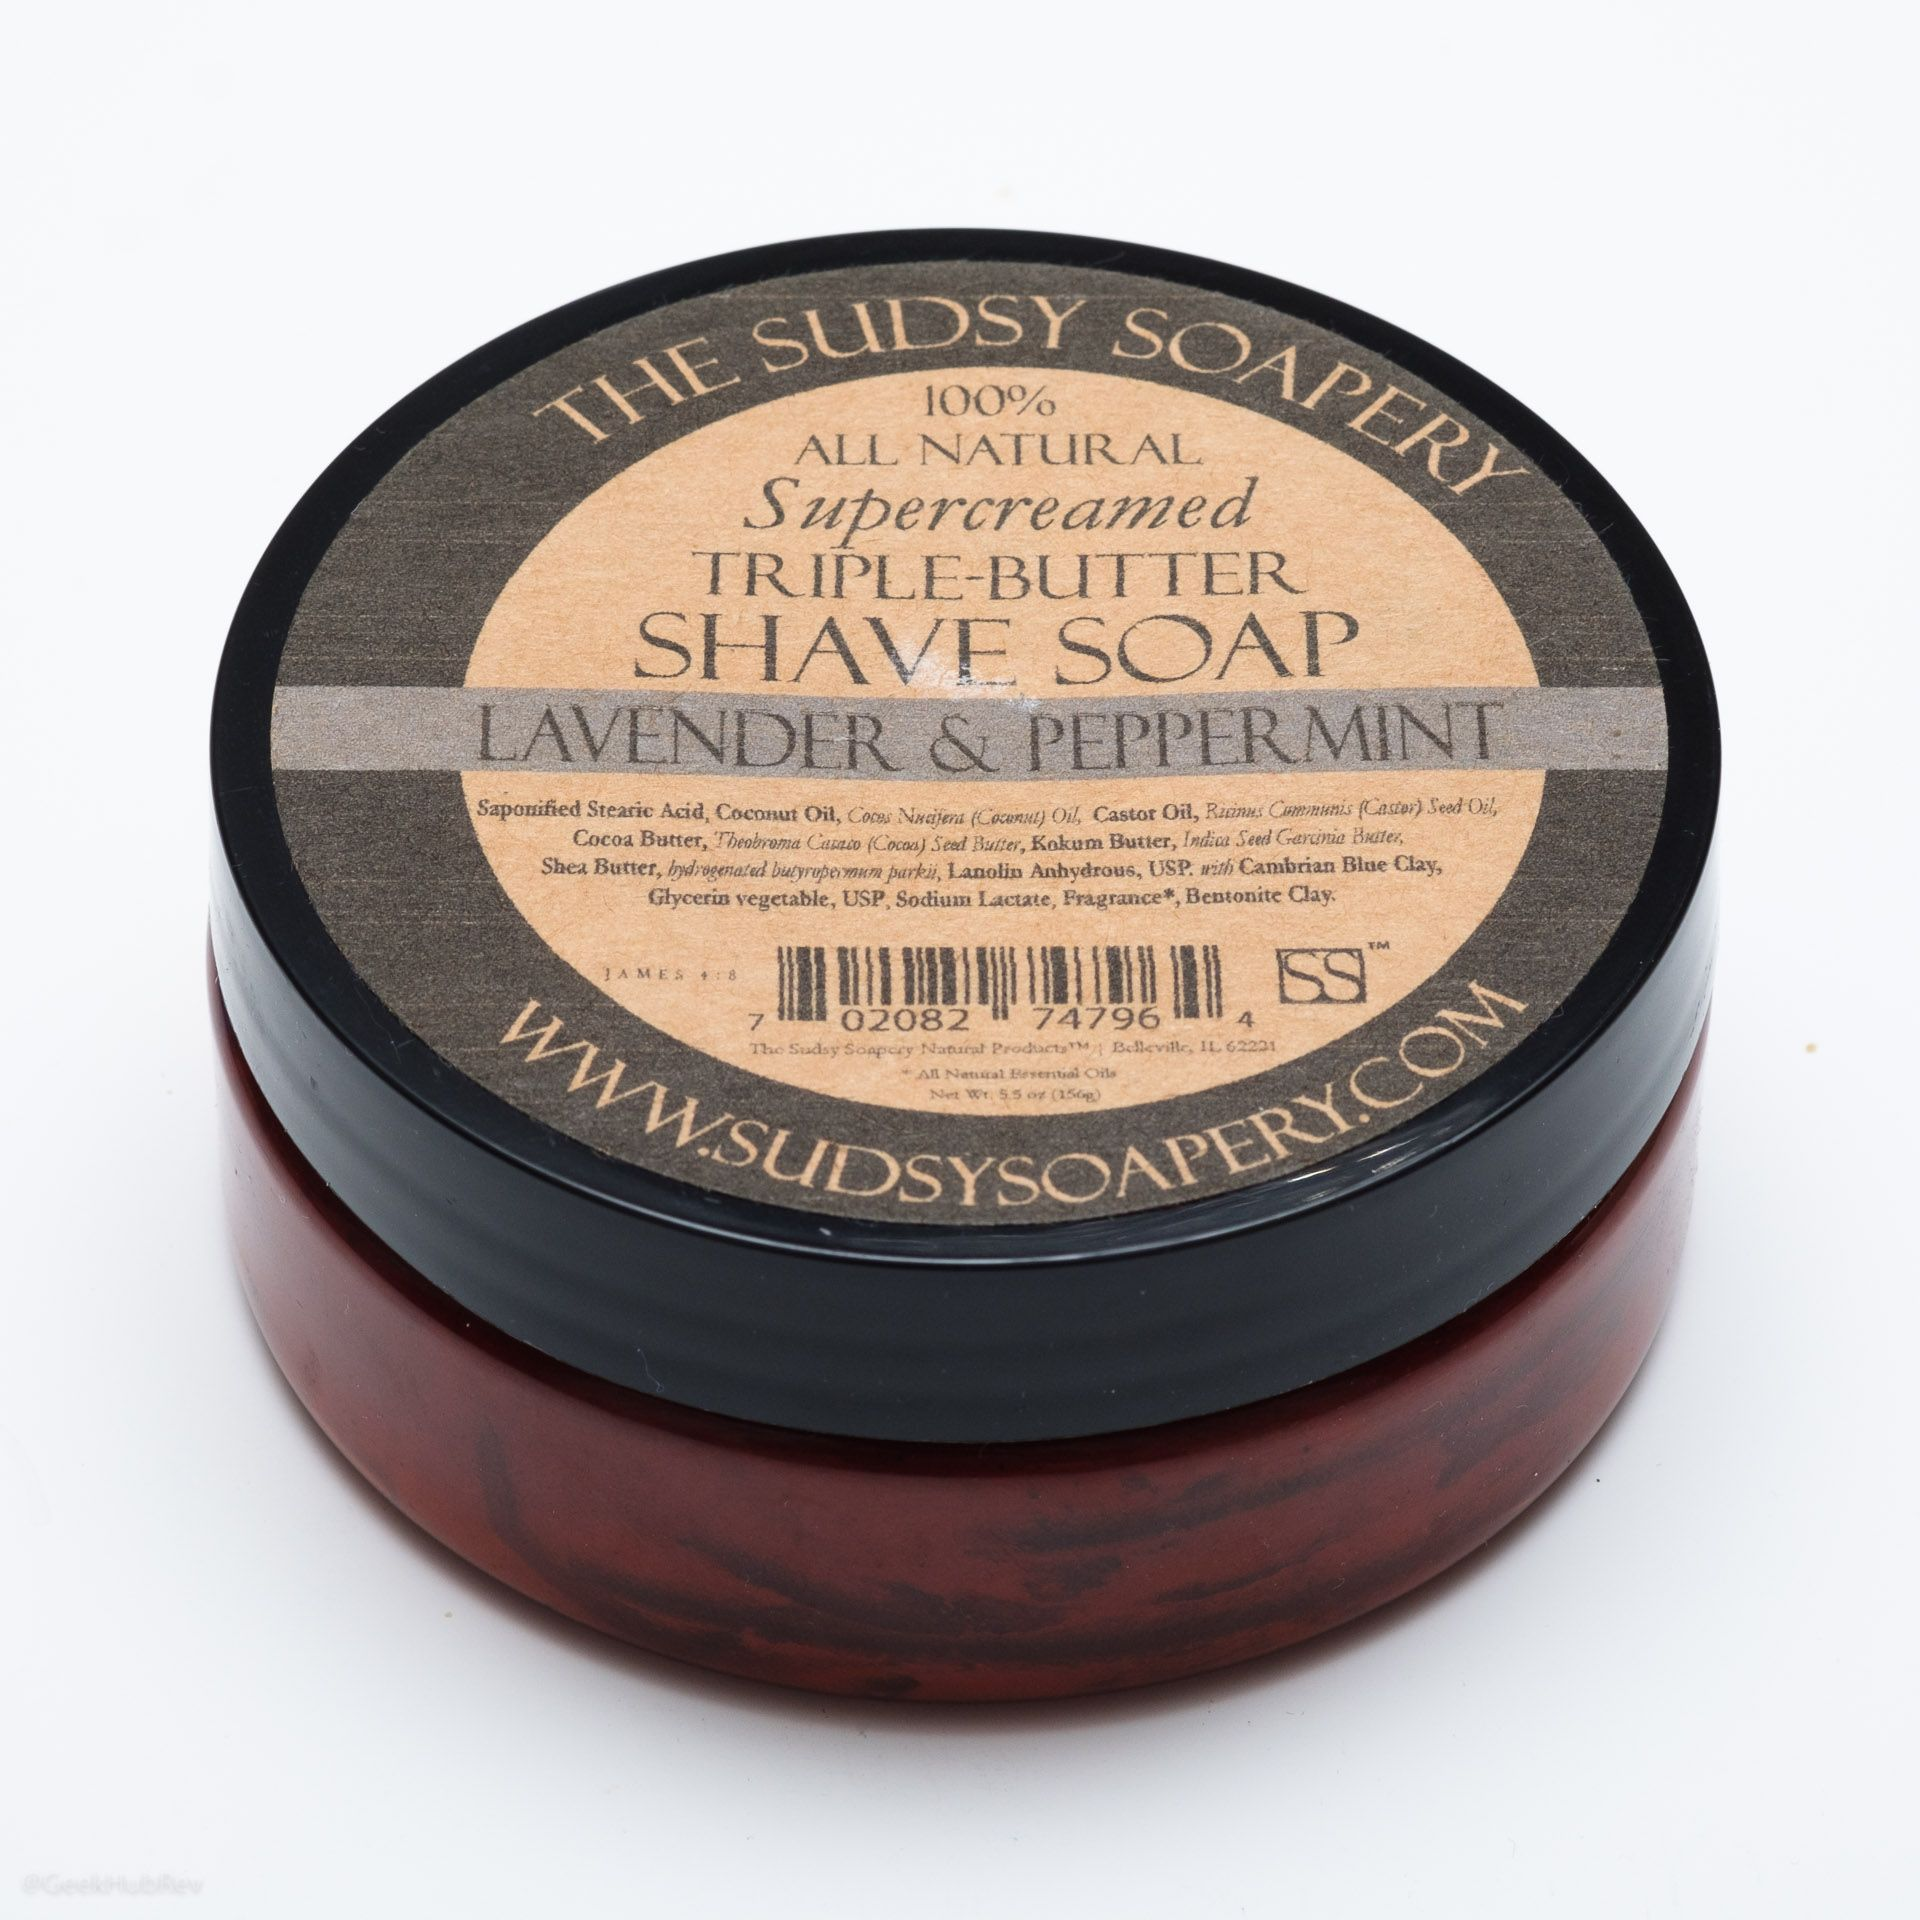 Opakowanie mydła do golenia Sudsy Soapery Lavender Peppermint Shave Soap